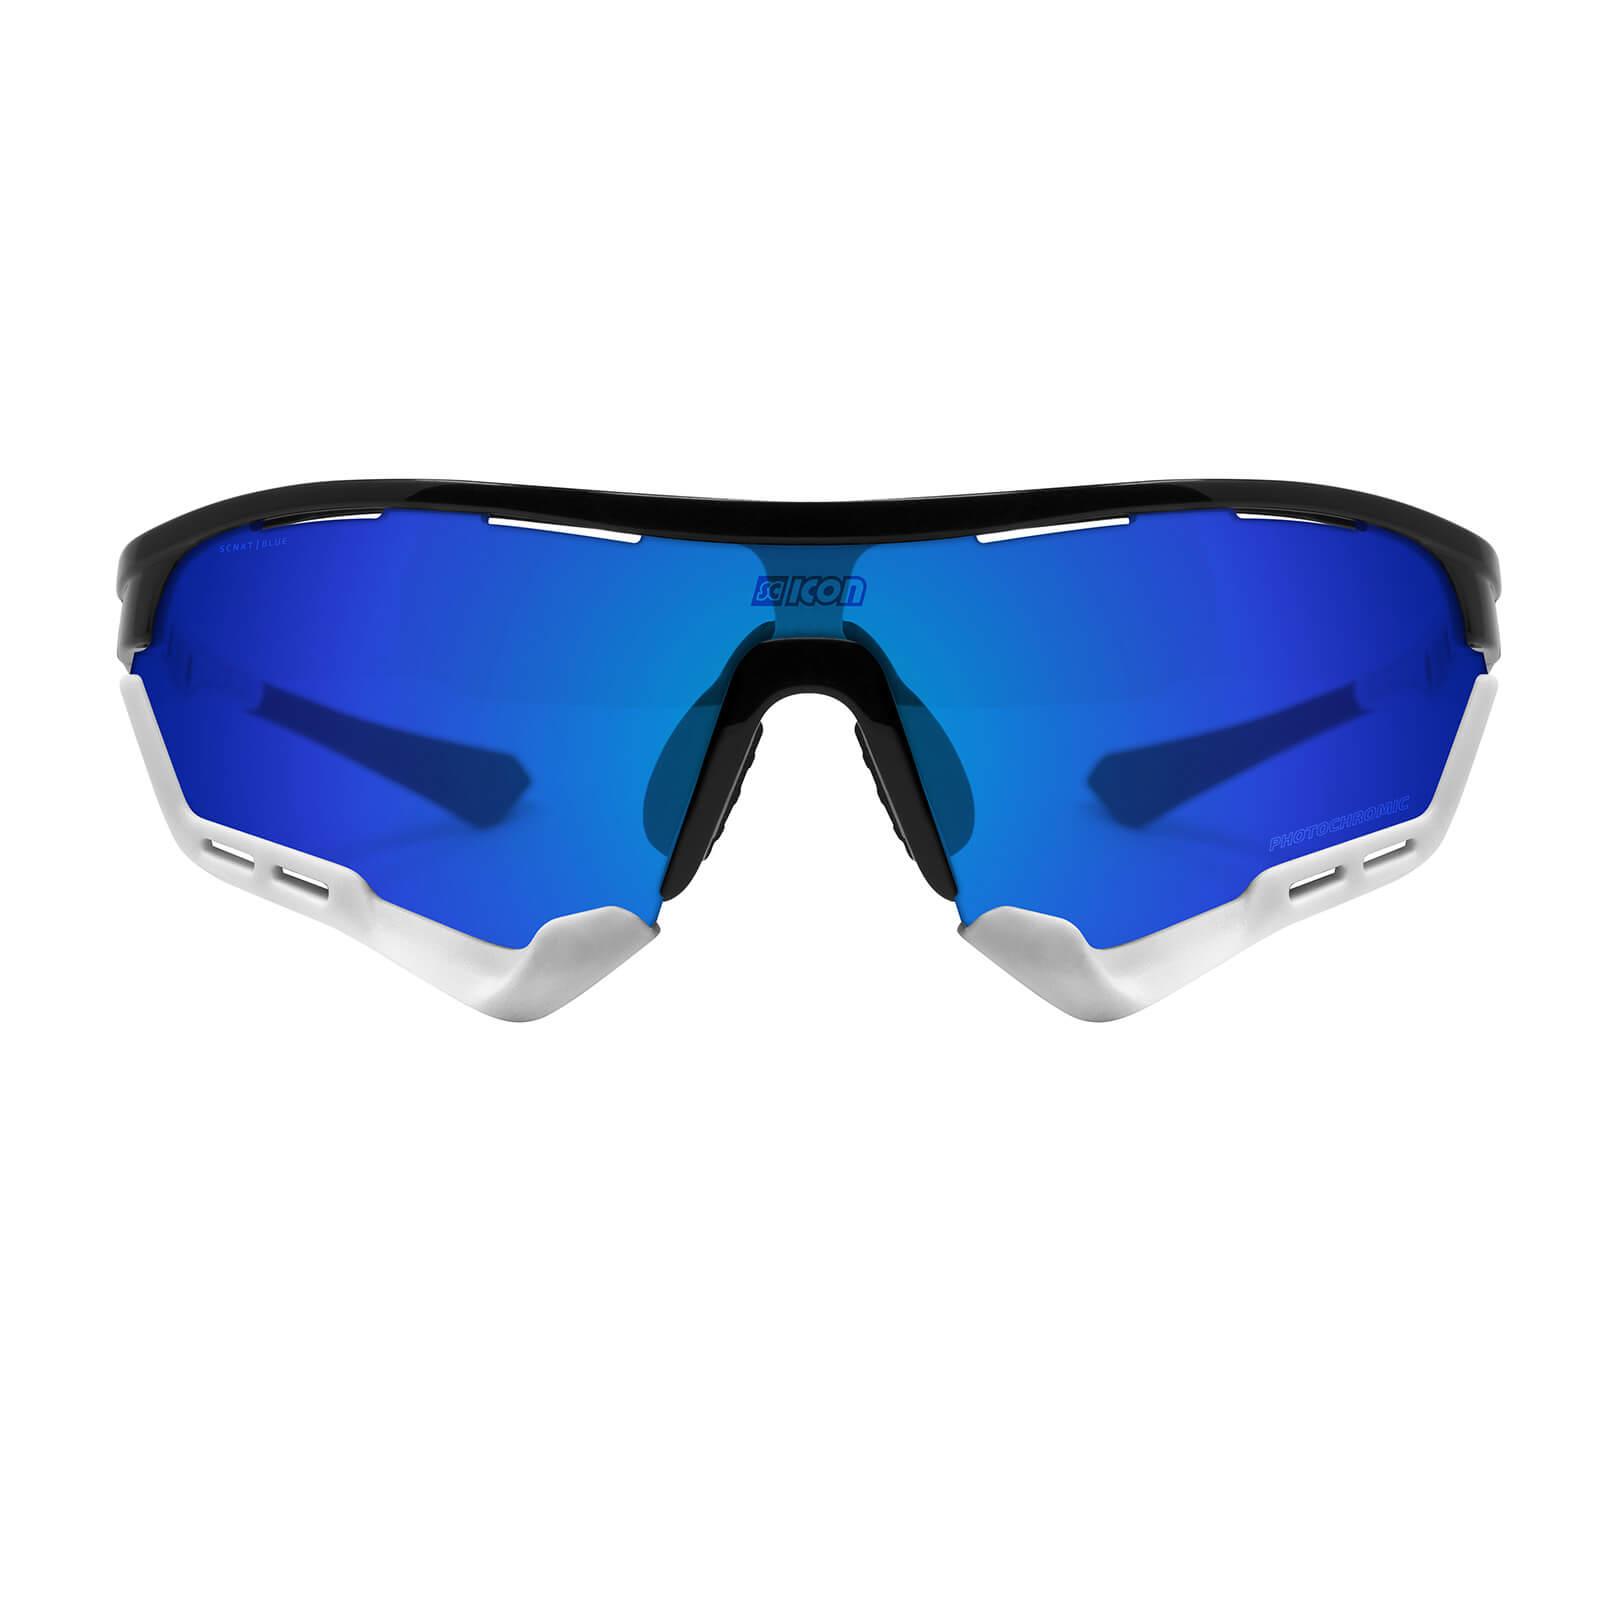 Scicon Aerotech Sunglasses SCN-XT Photochromic Blue Mirror Lens - Black Gloss Frame - XL Lens